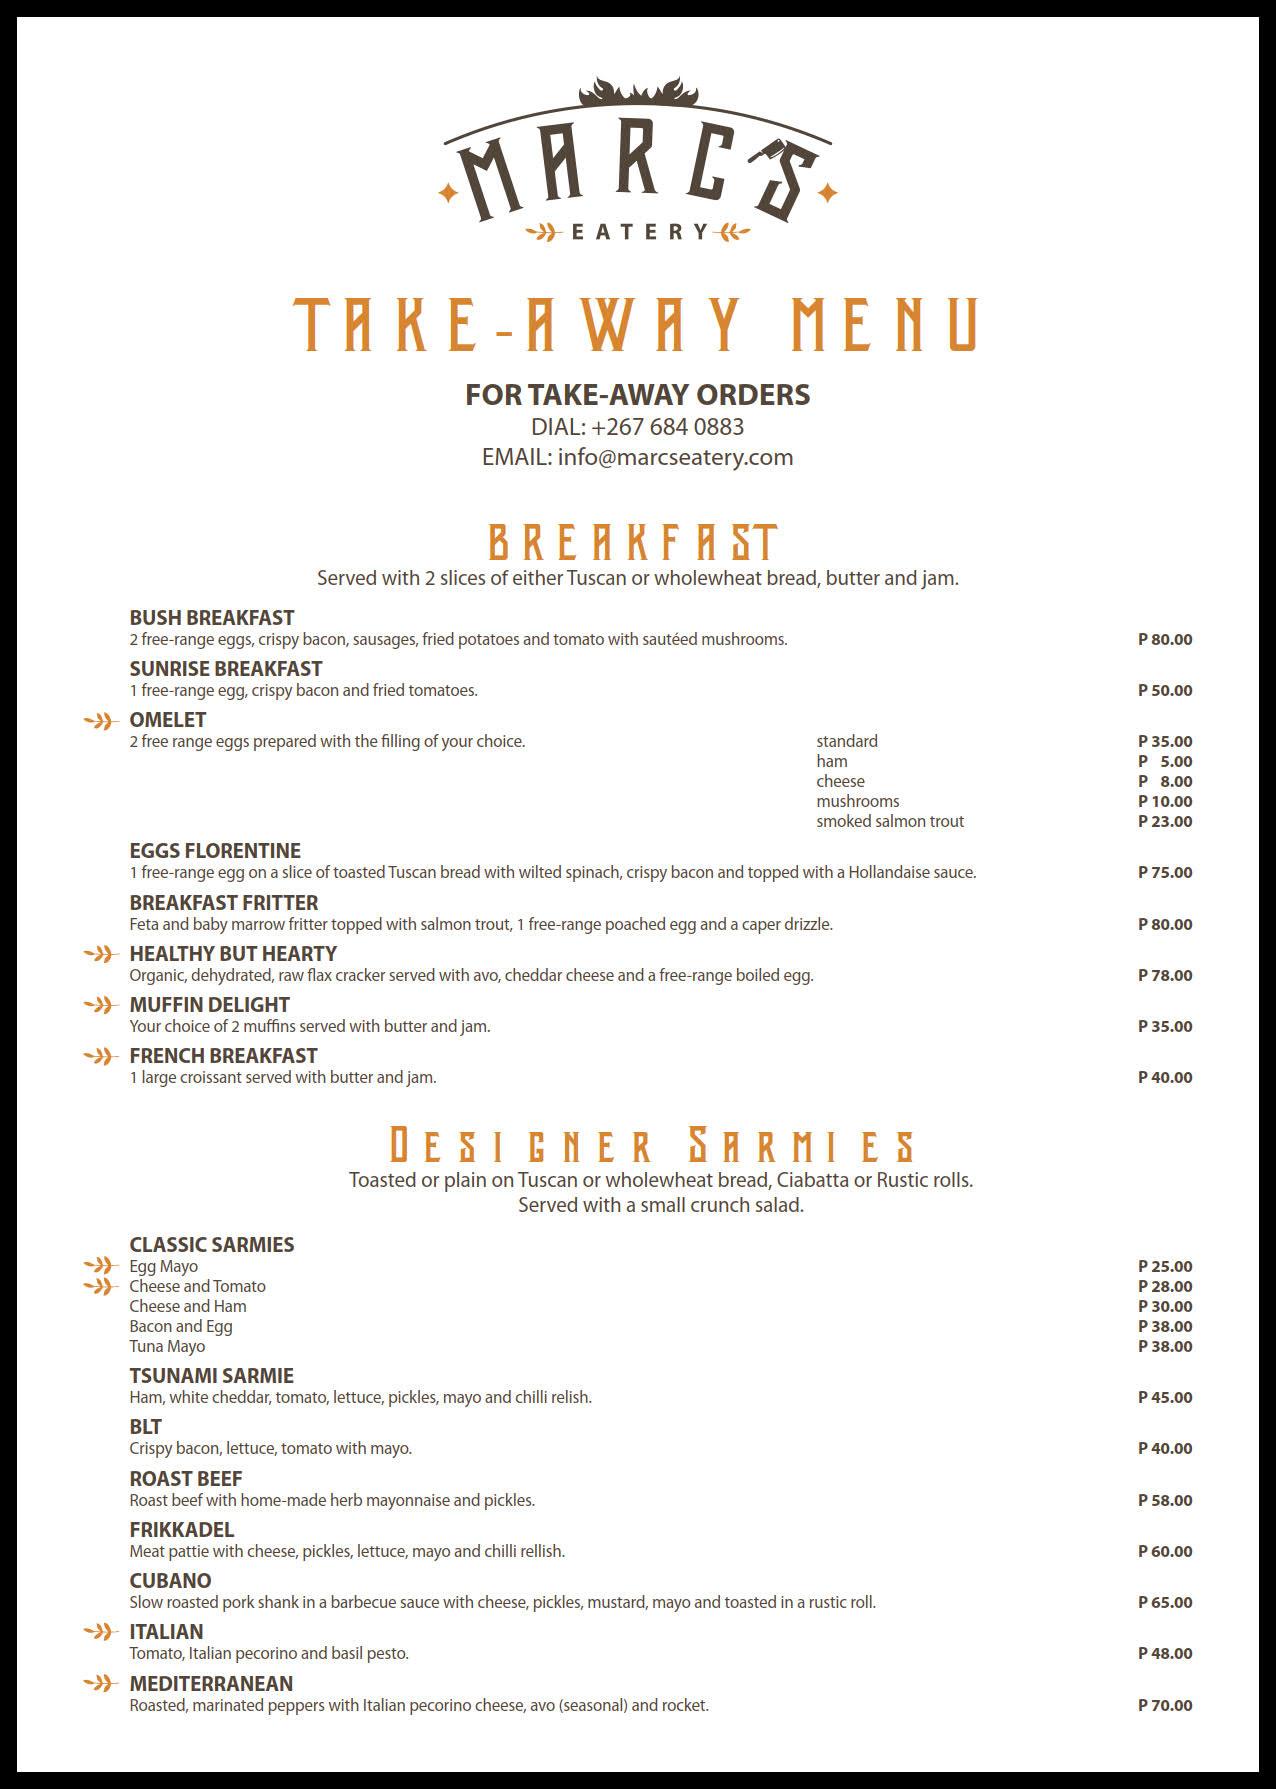 Marc's Eatery Take-Away Menu1